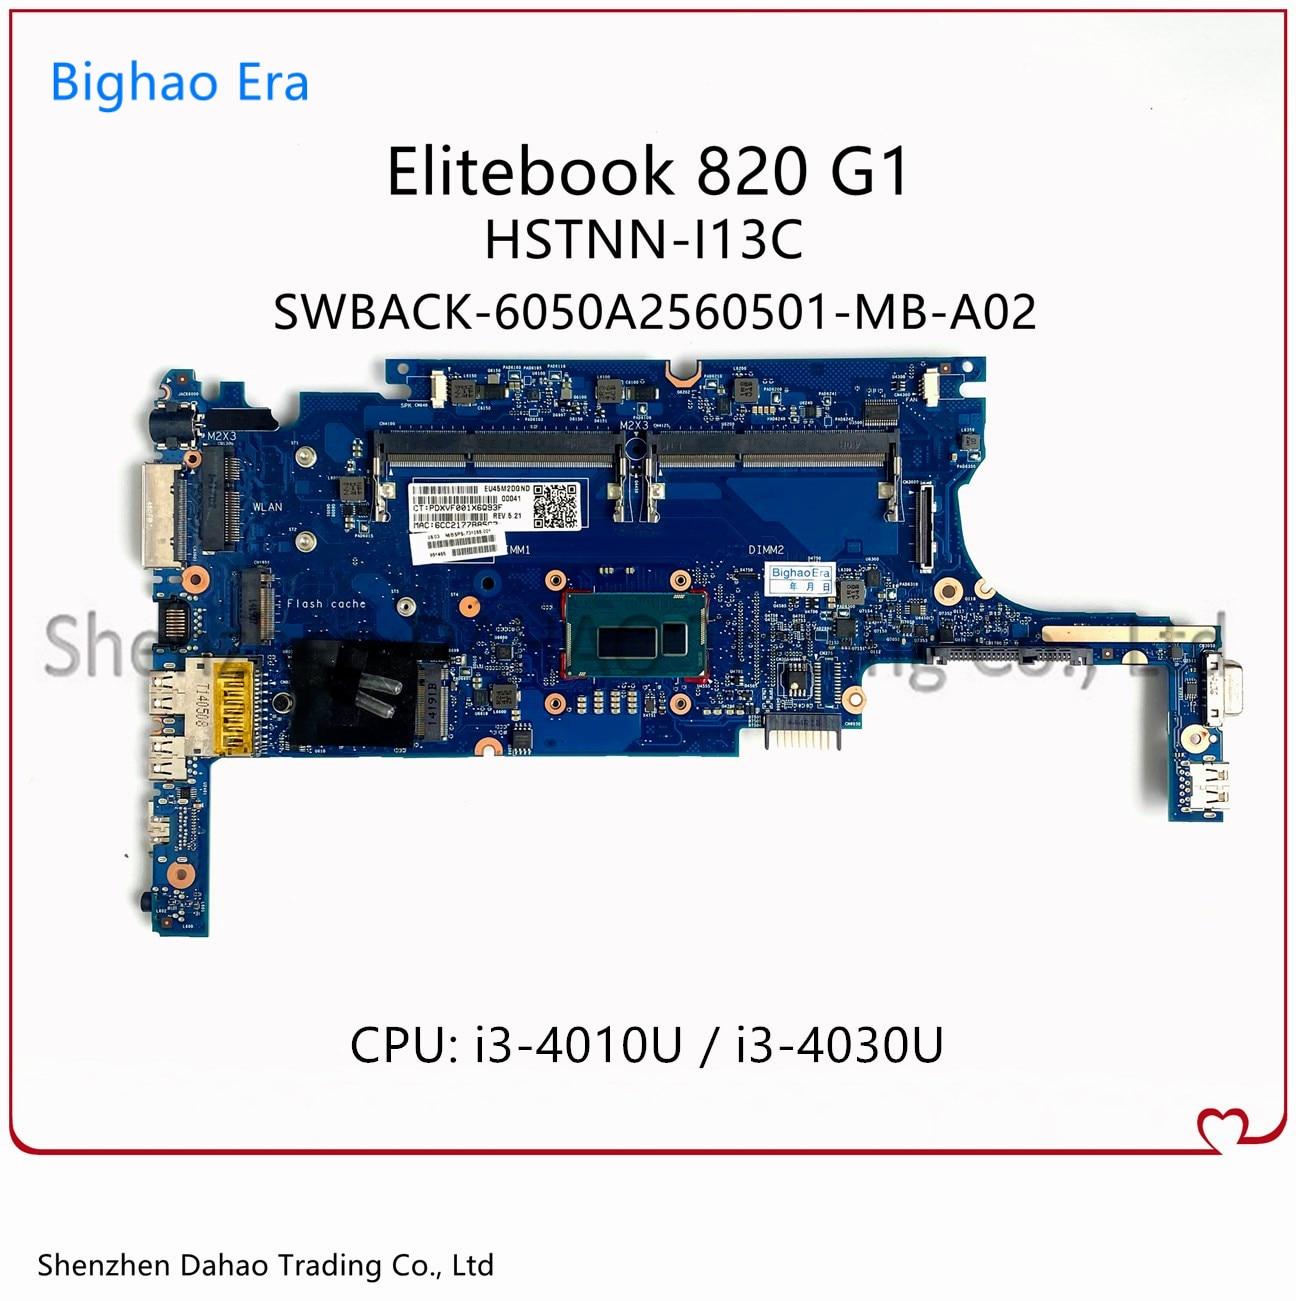 730557-001 802500-001 778828-601 ل HP بي Elitebook 820 G1 اللوحة المحمول W/ i3-4010U/4030U CPU 6050A2630701-MB-A01 HSTNN-I13C